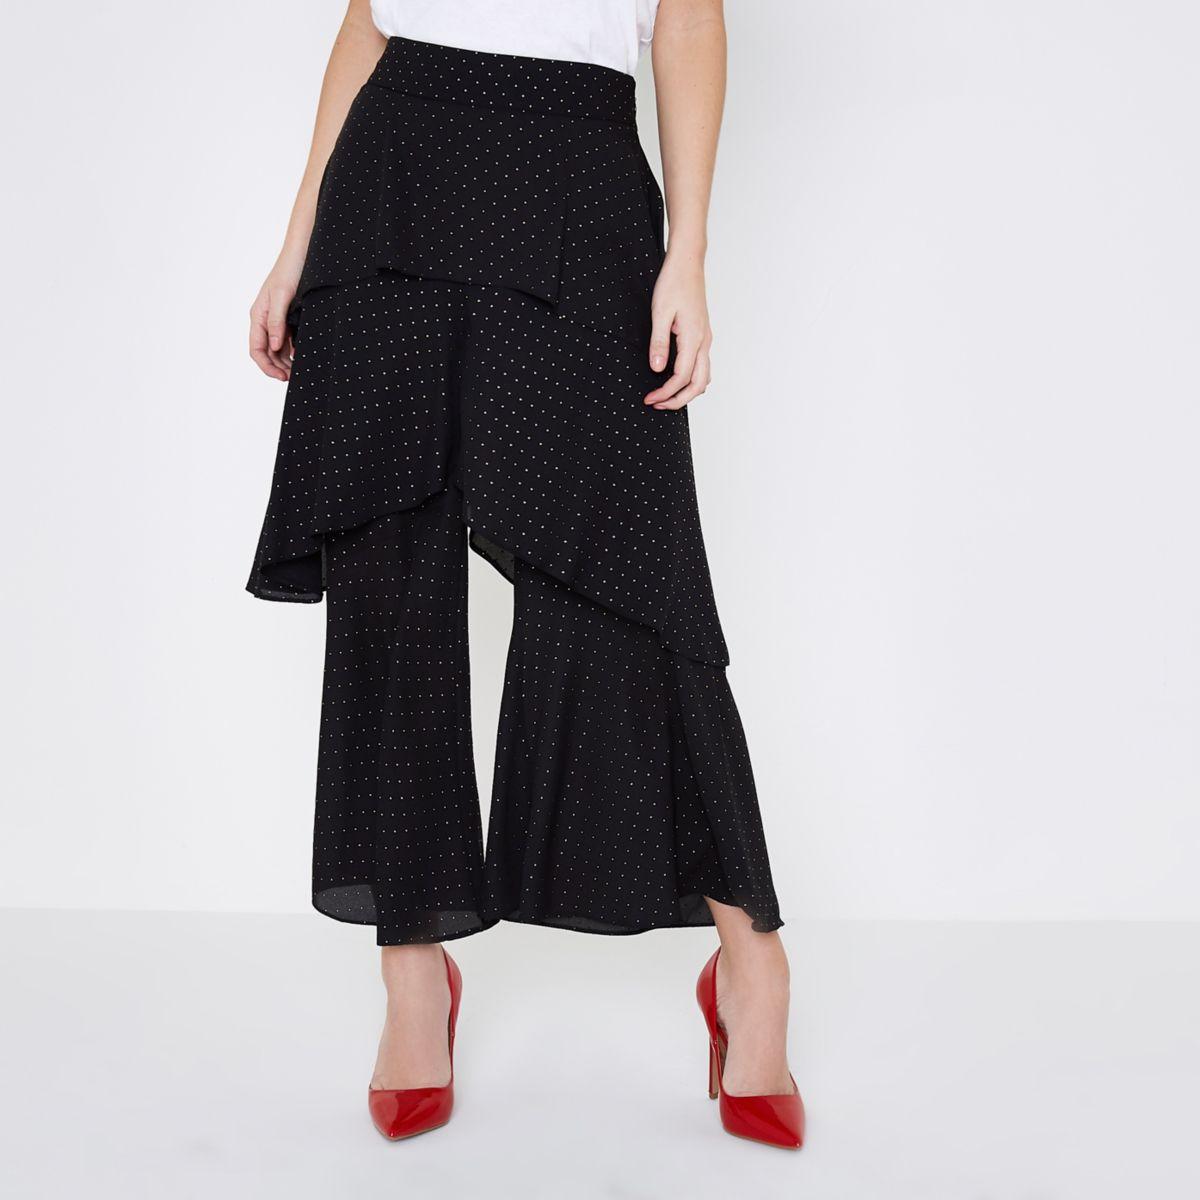 Petite black polka dot rara layer culottes